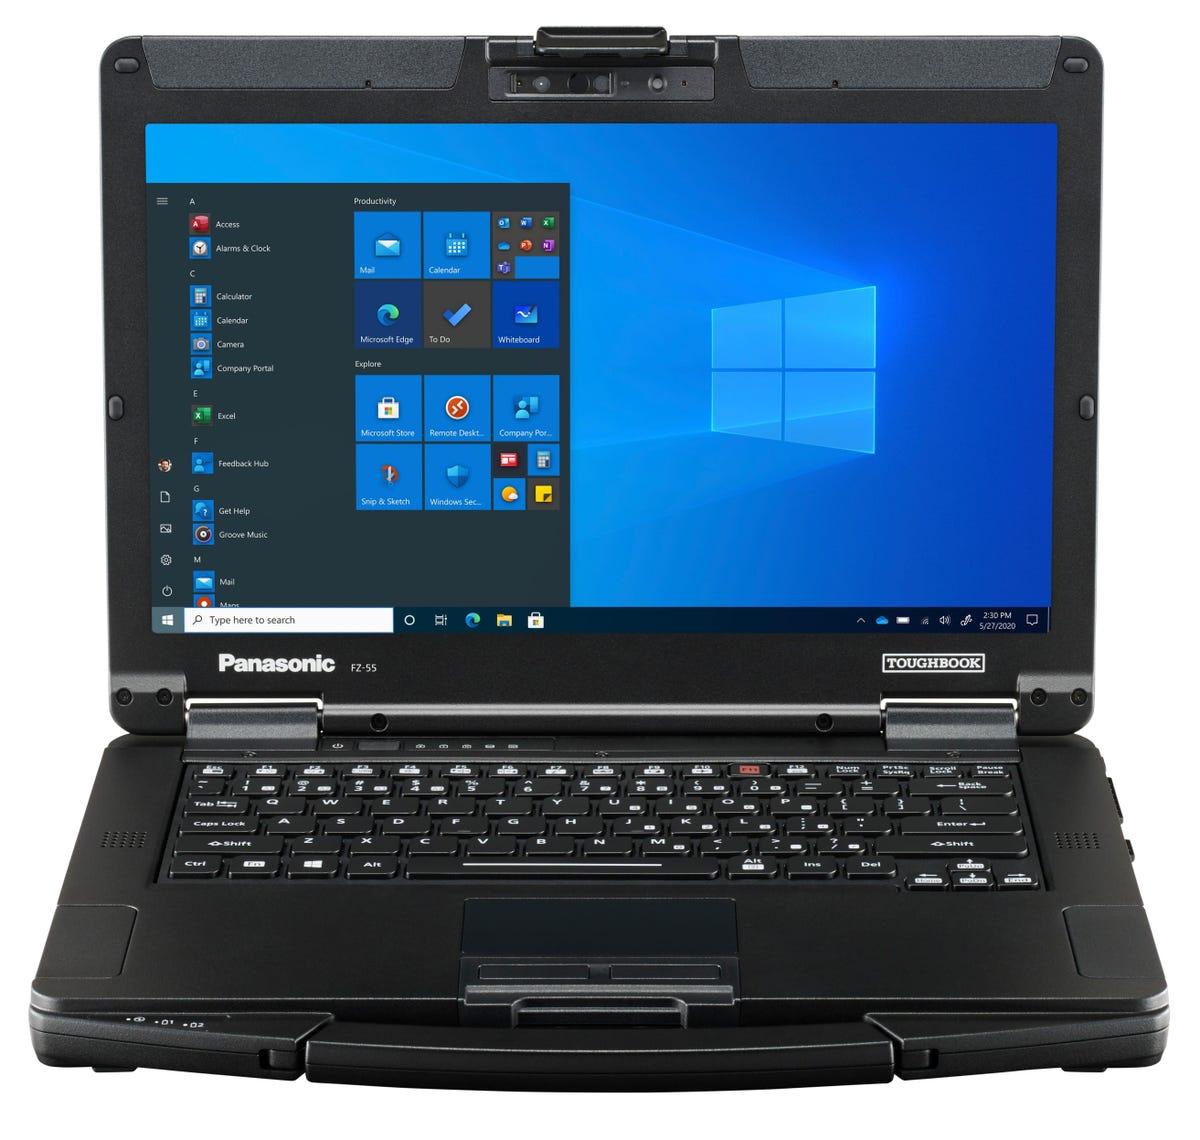 panasonic-toughbook-fz-55-rugged-laptop-notebook.jpg